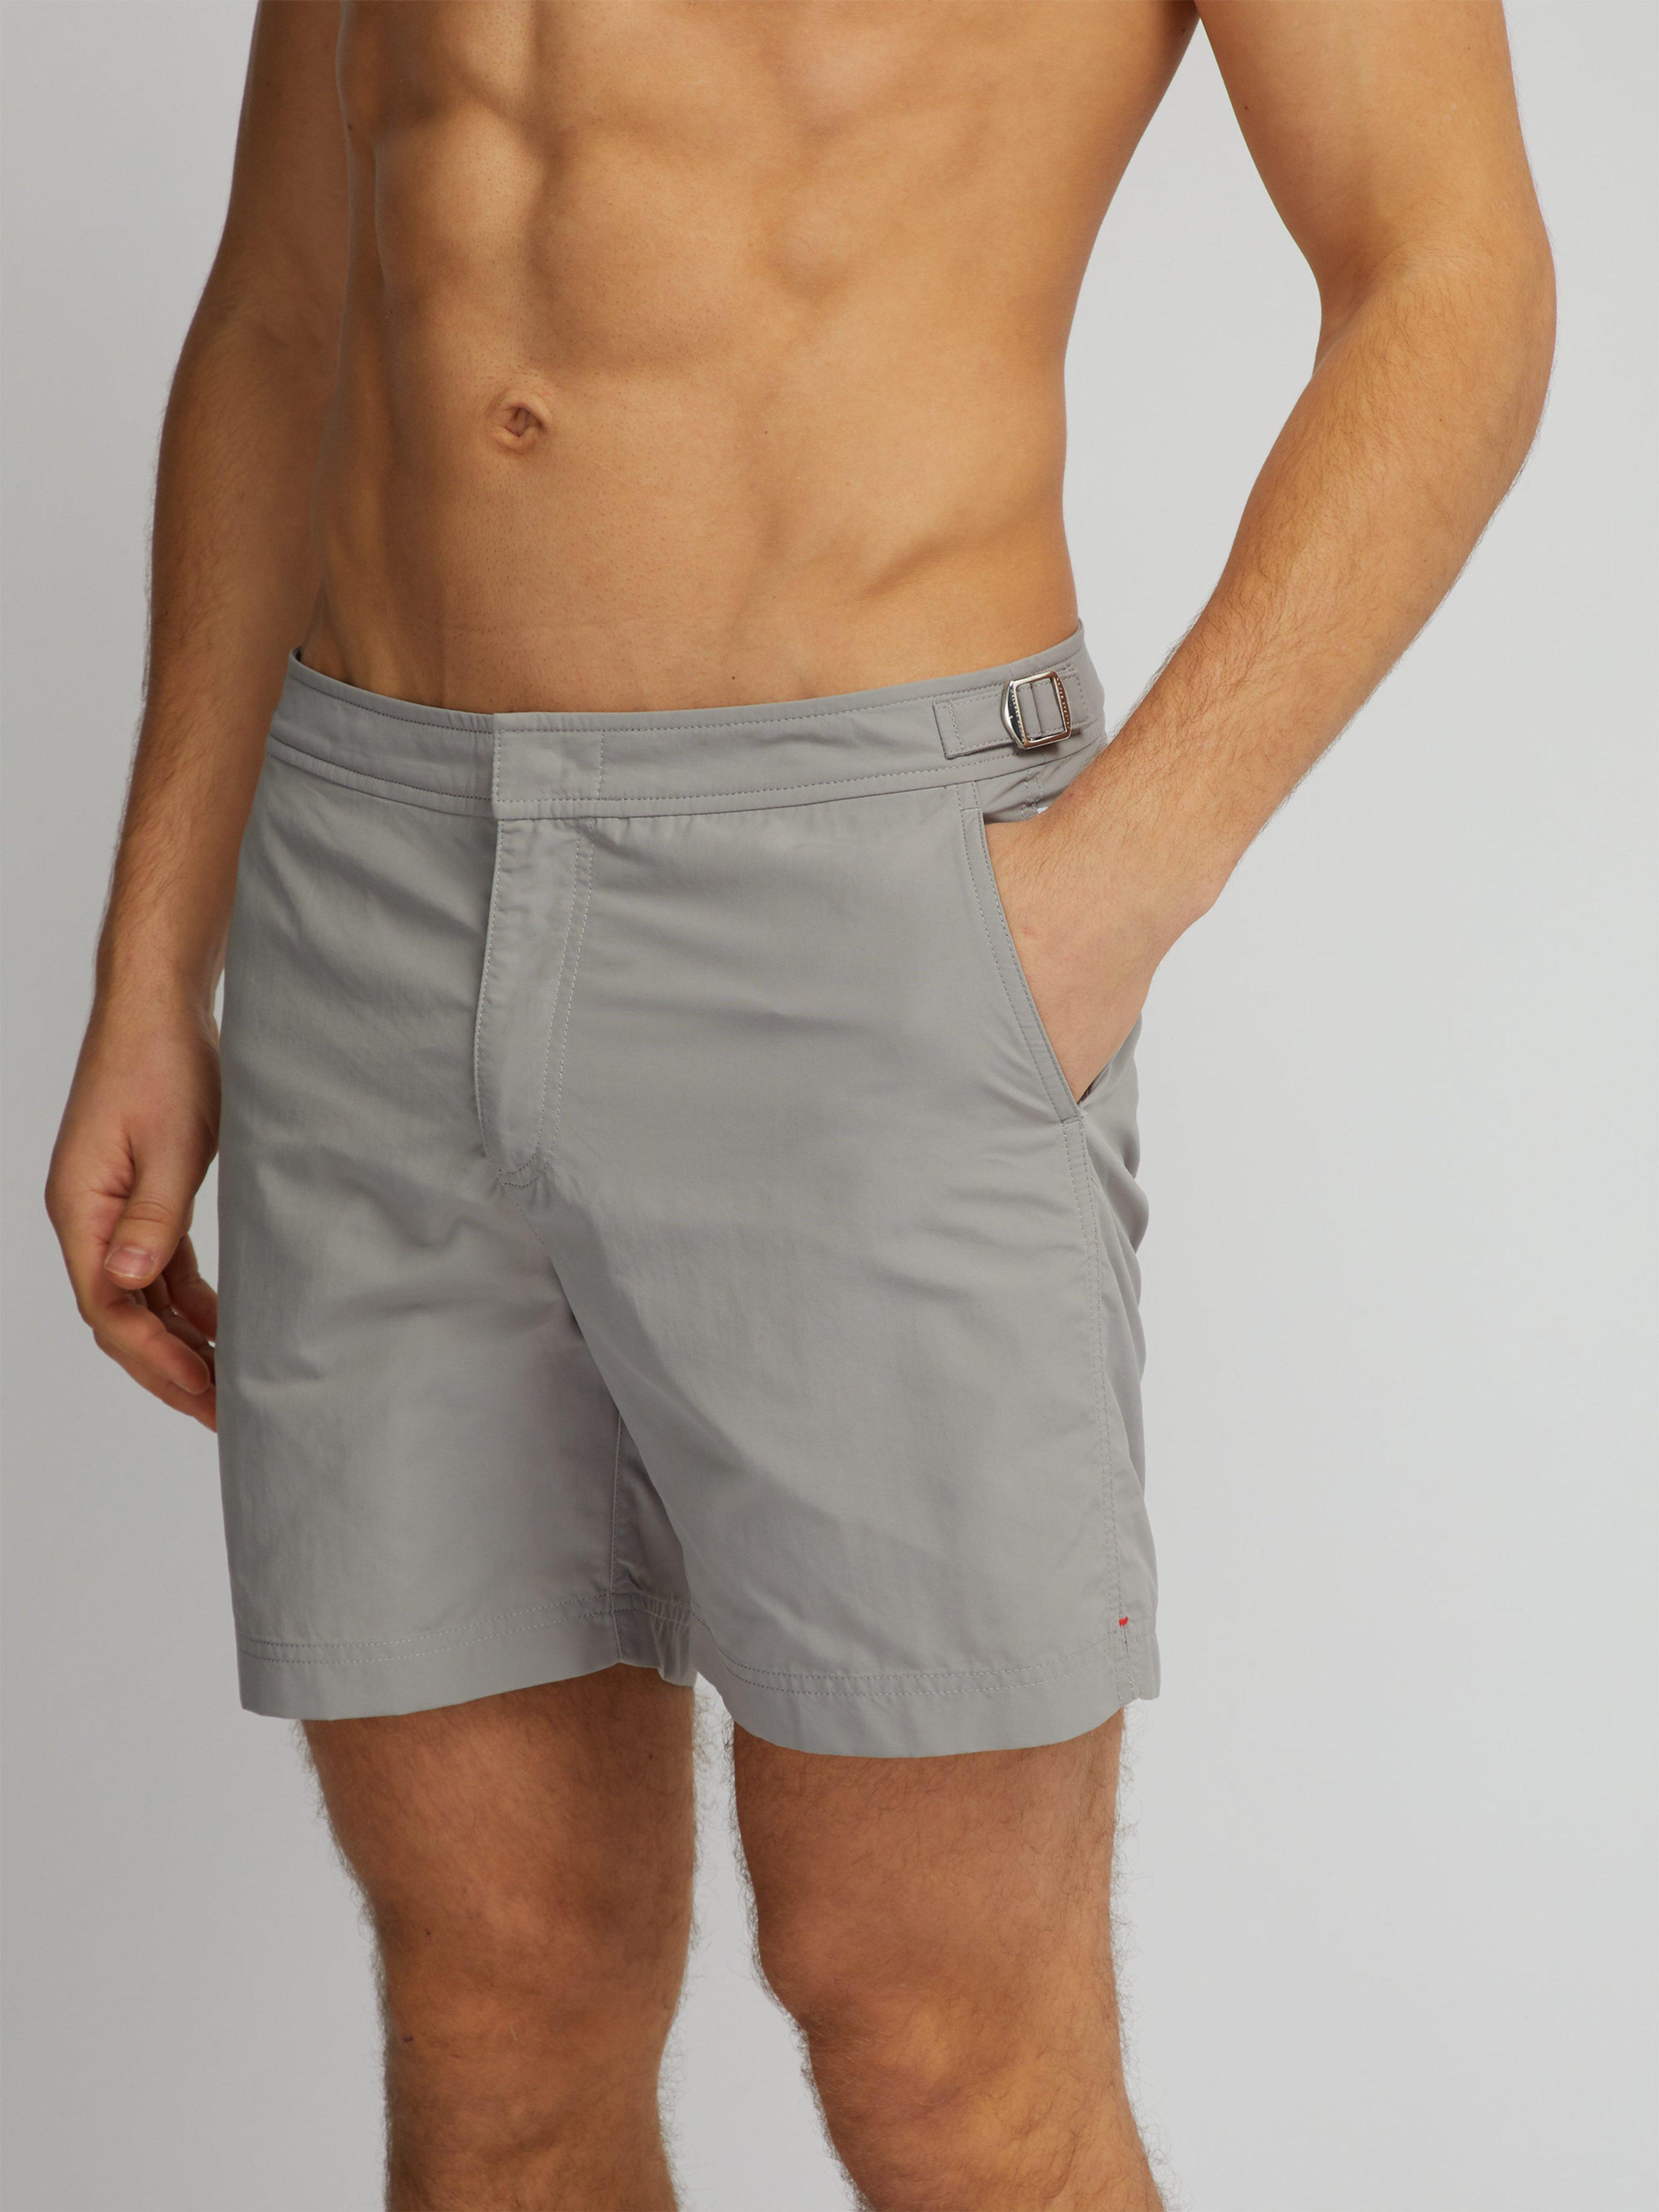 6cd534e152df7 Orlebar Brown Bulldog Swim Shorts in Gray for Men - Lyst